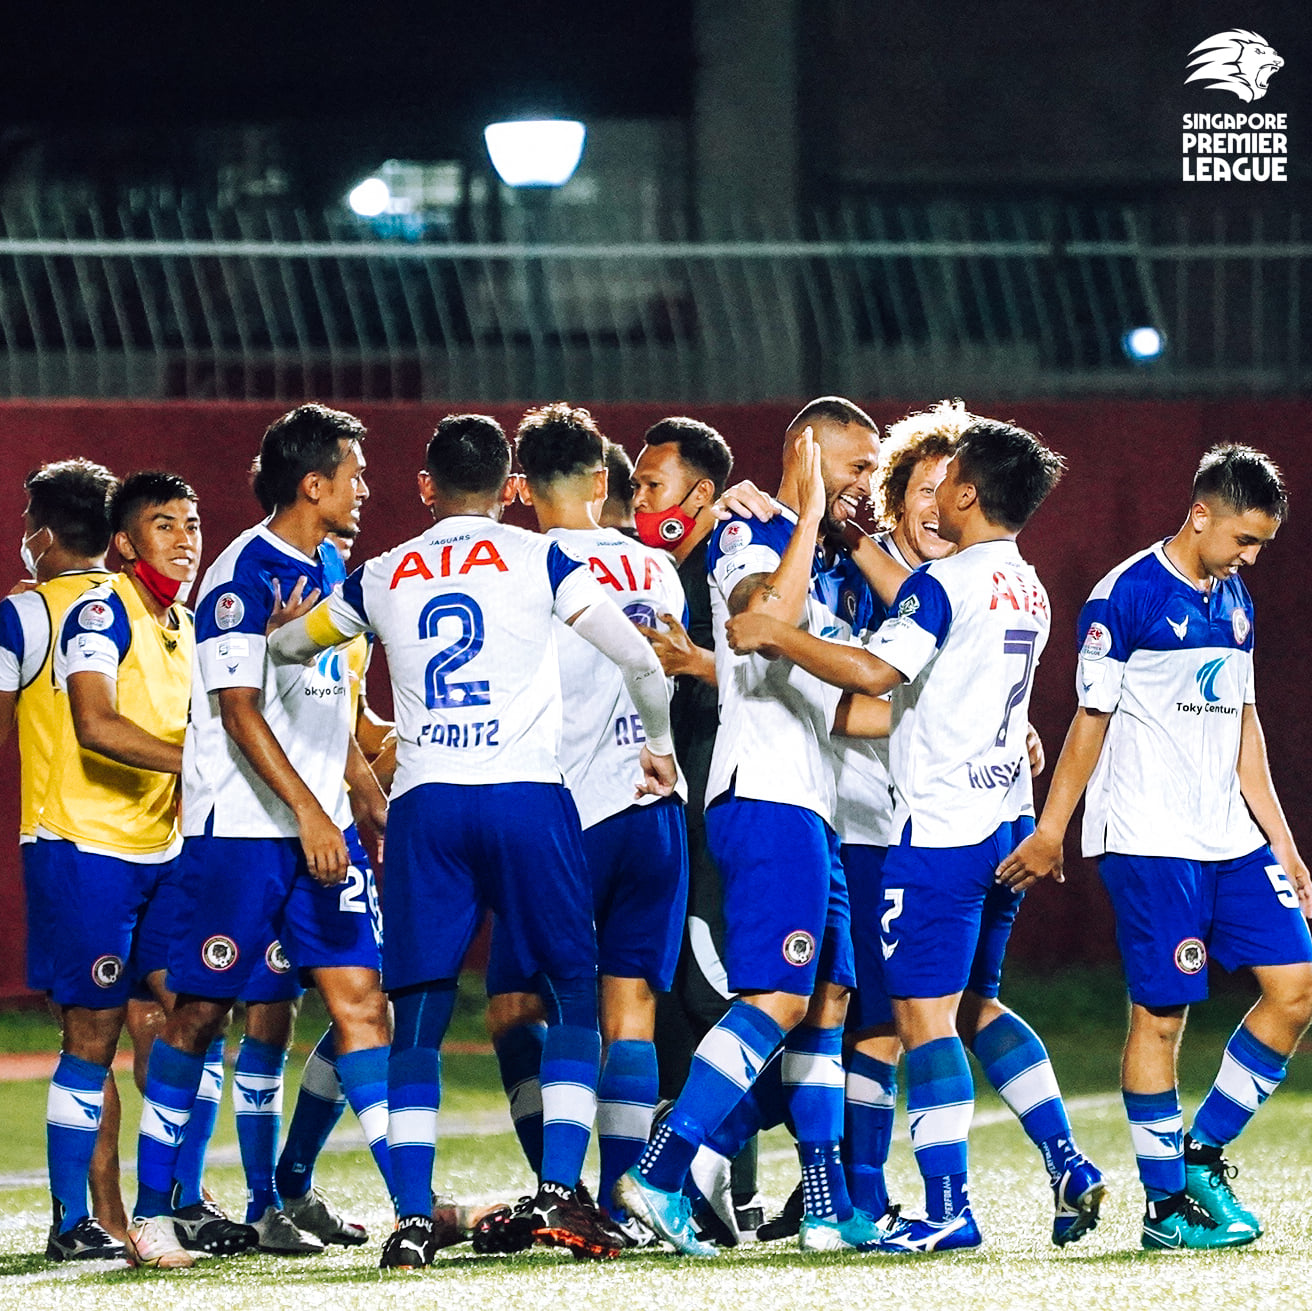 SPL : Tanjong Pagar United end Albirex Niigata's 13-match unbeaten league streak with 2-1 win!